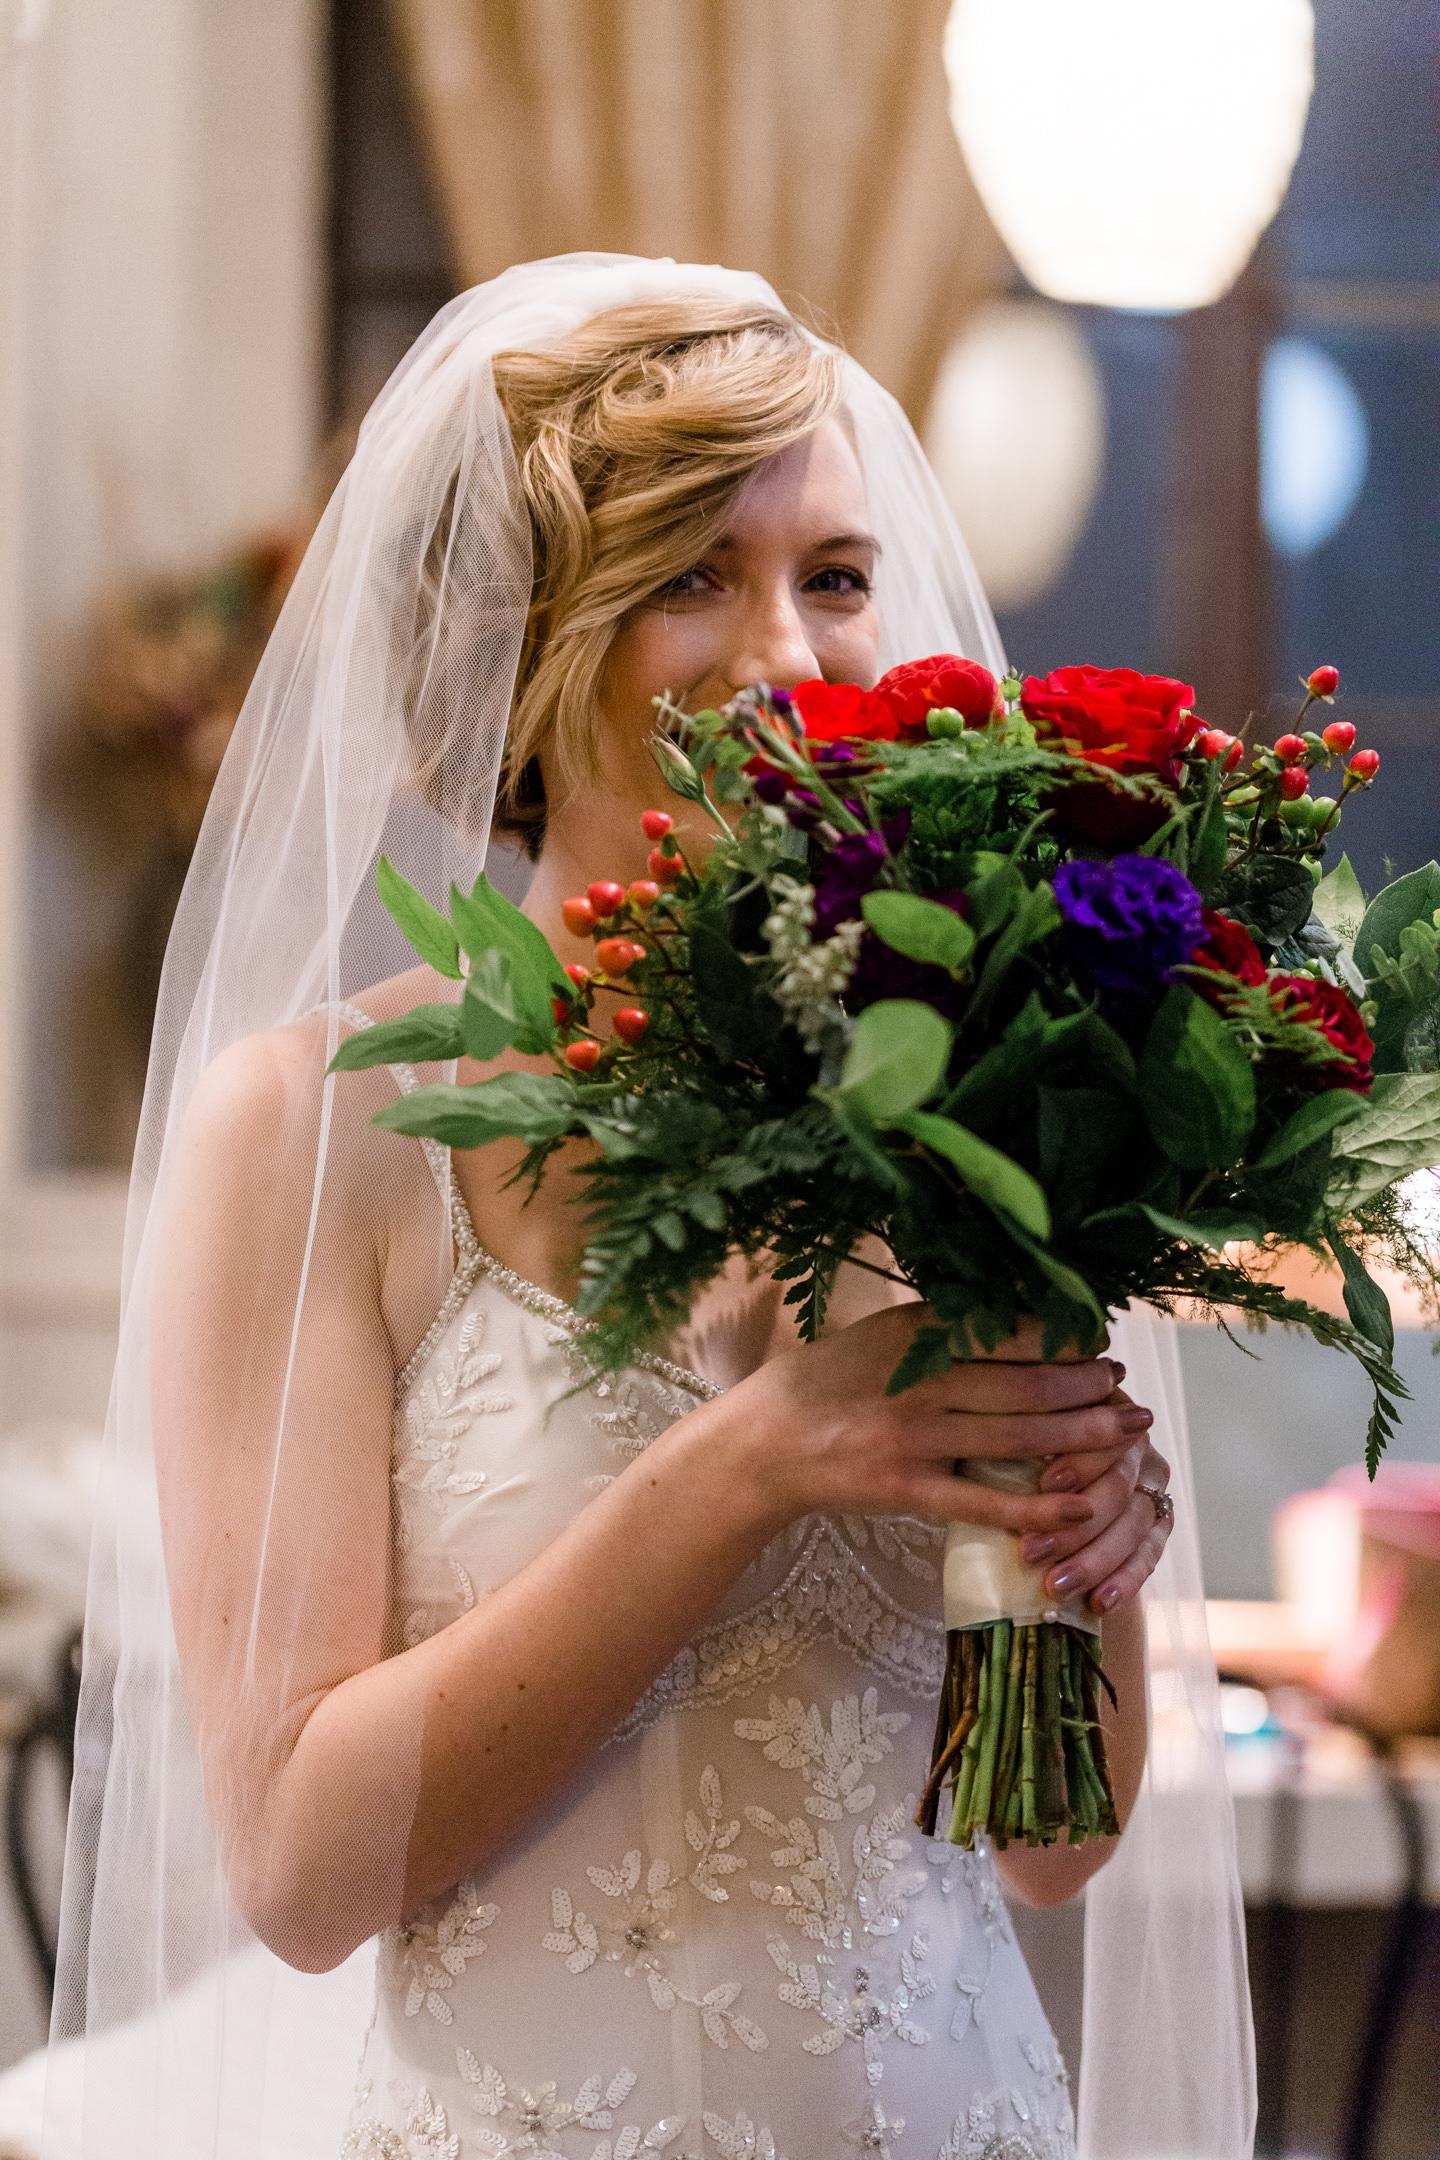 Documentary-Wedding-Photography-Andrew-Tat-Gabi & Kim-11.jpg